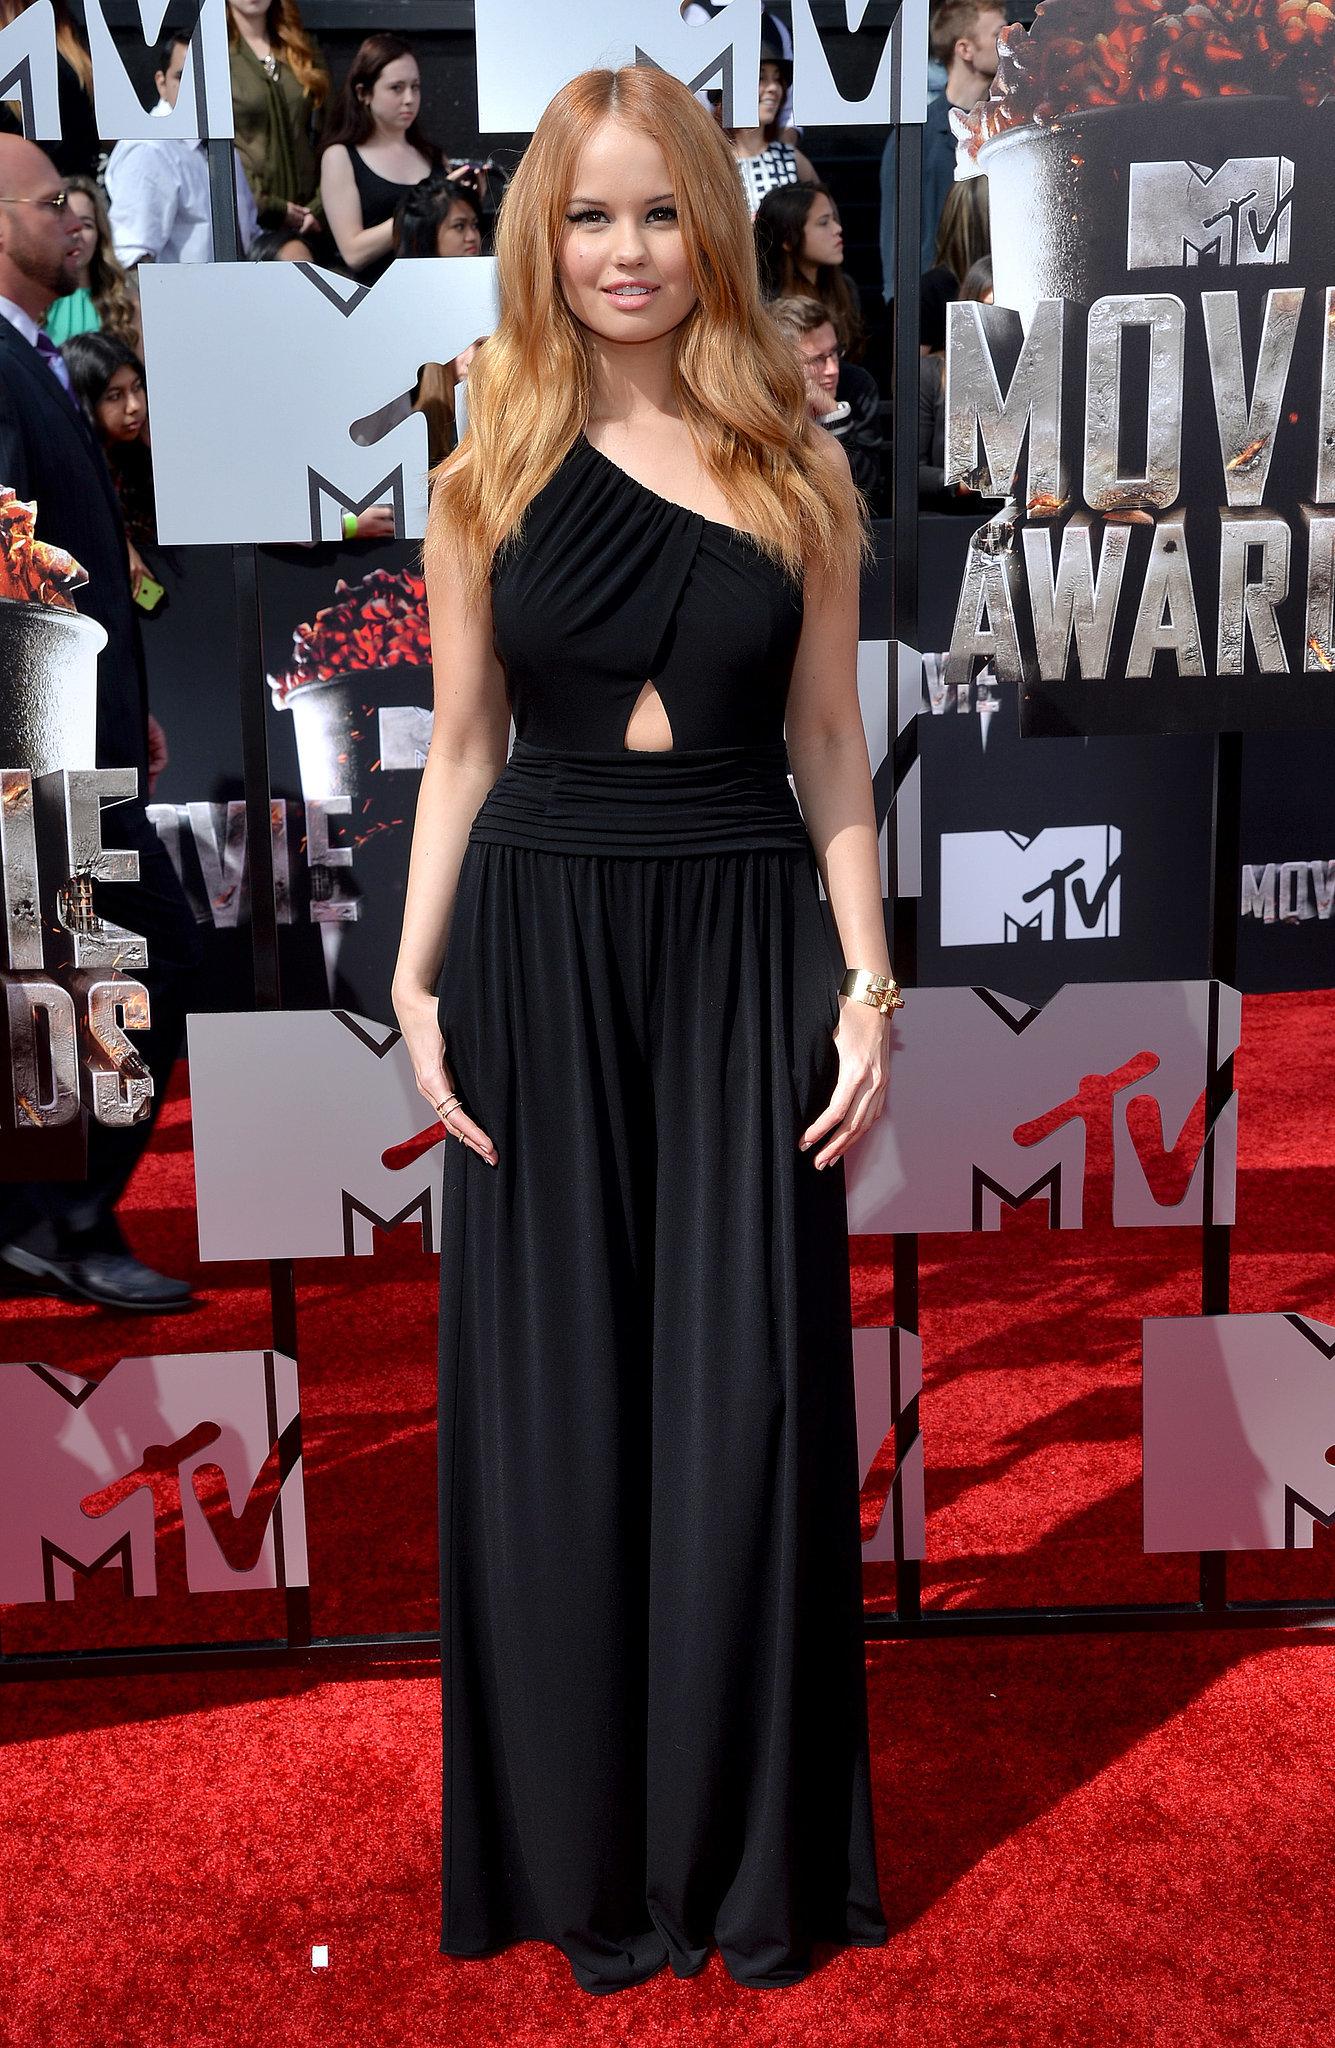 Debby Ryan at the 2014 MTV Movie Awards